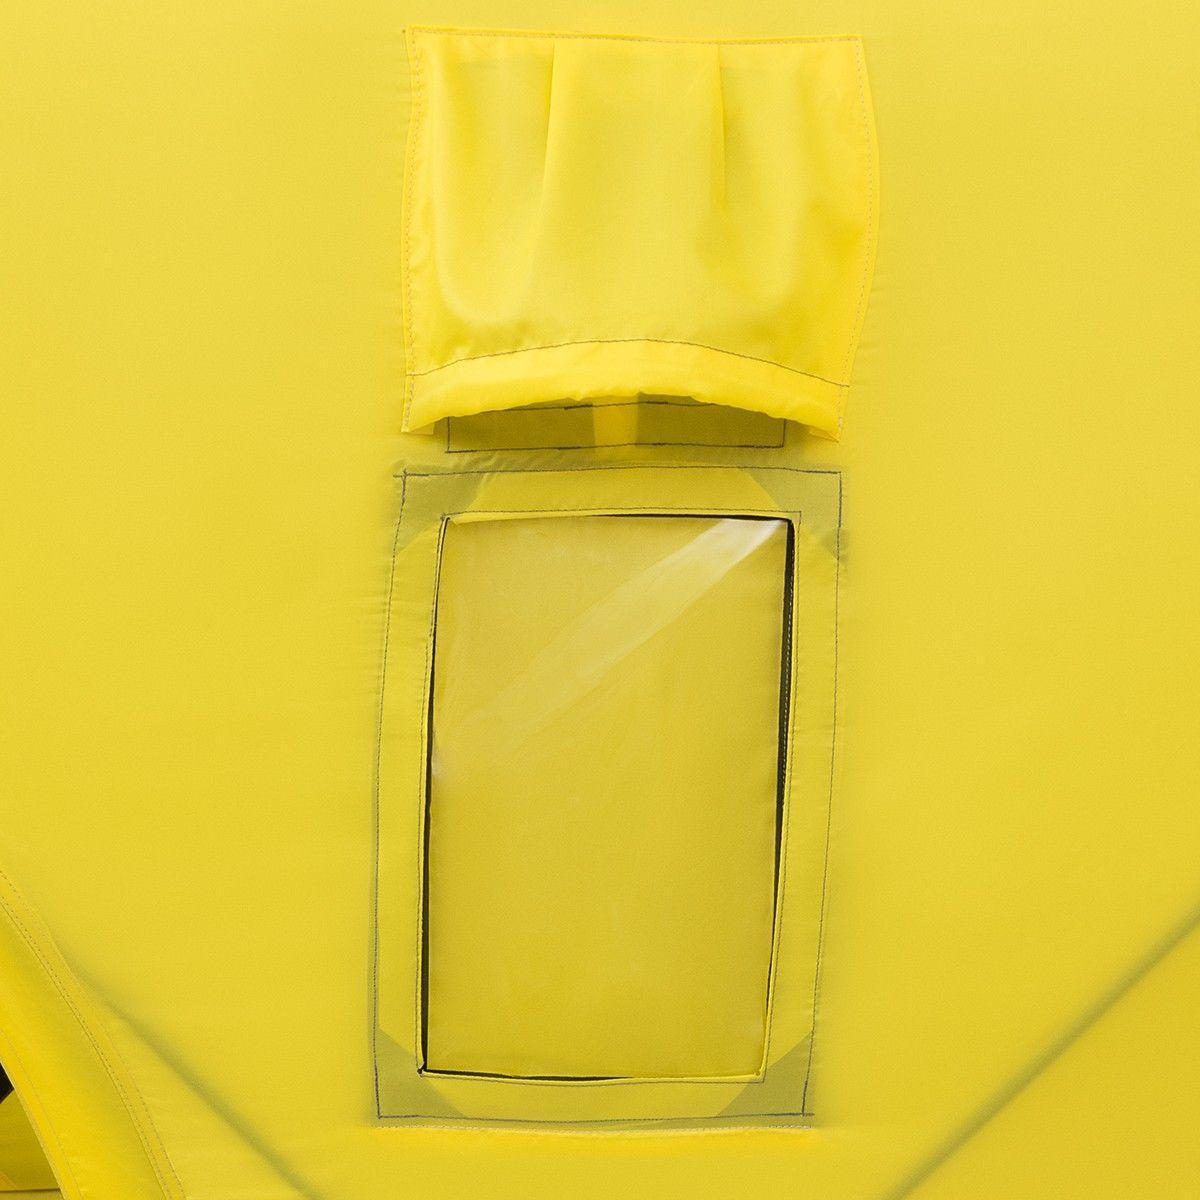 Палатка зимняя куб 1,8х1,8 yellow/gray helios (hs-isc-180yg) tr-85084 - фото 3